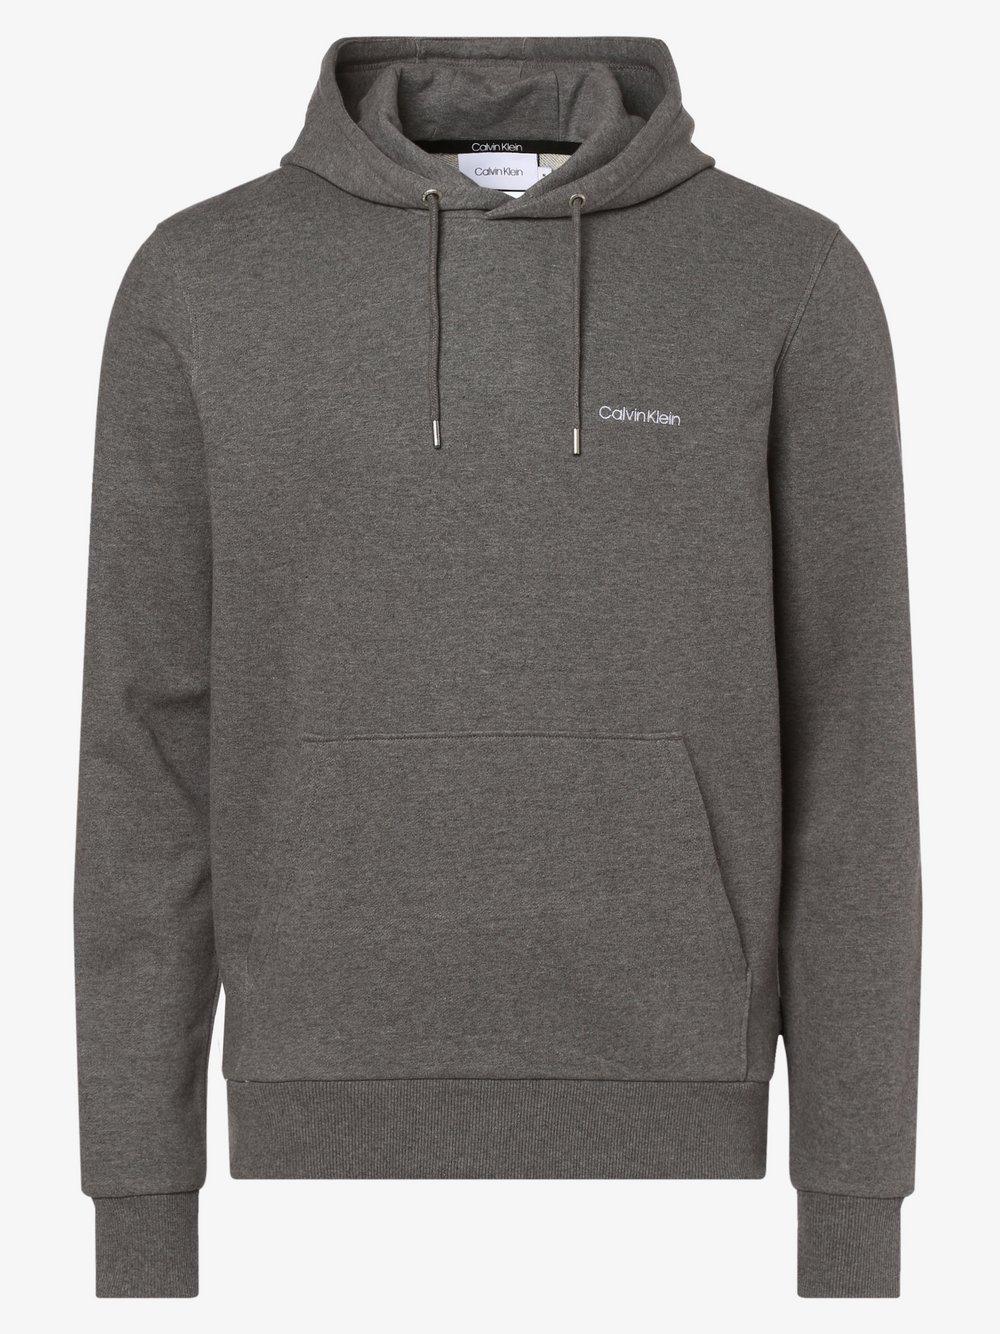 Calvin Klein - Męska bluza nierozpinana, szary